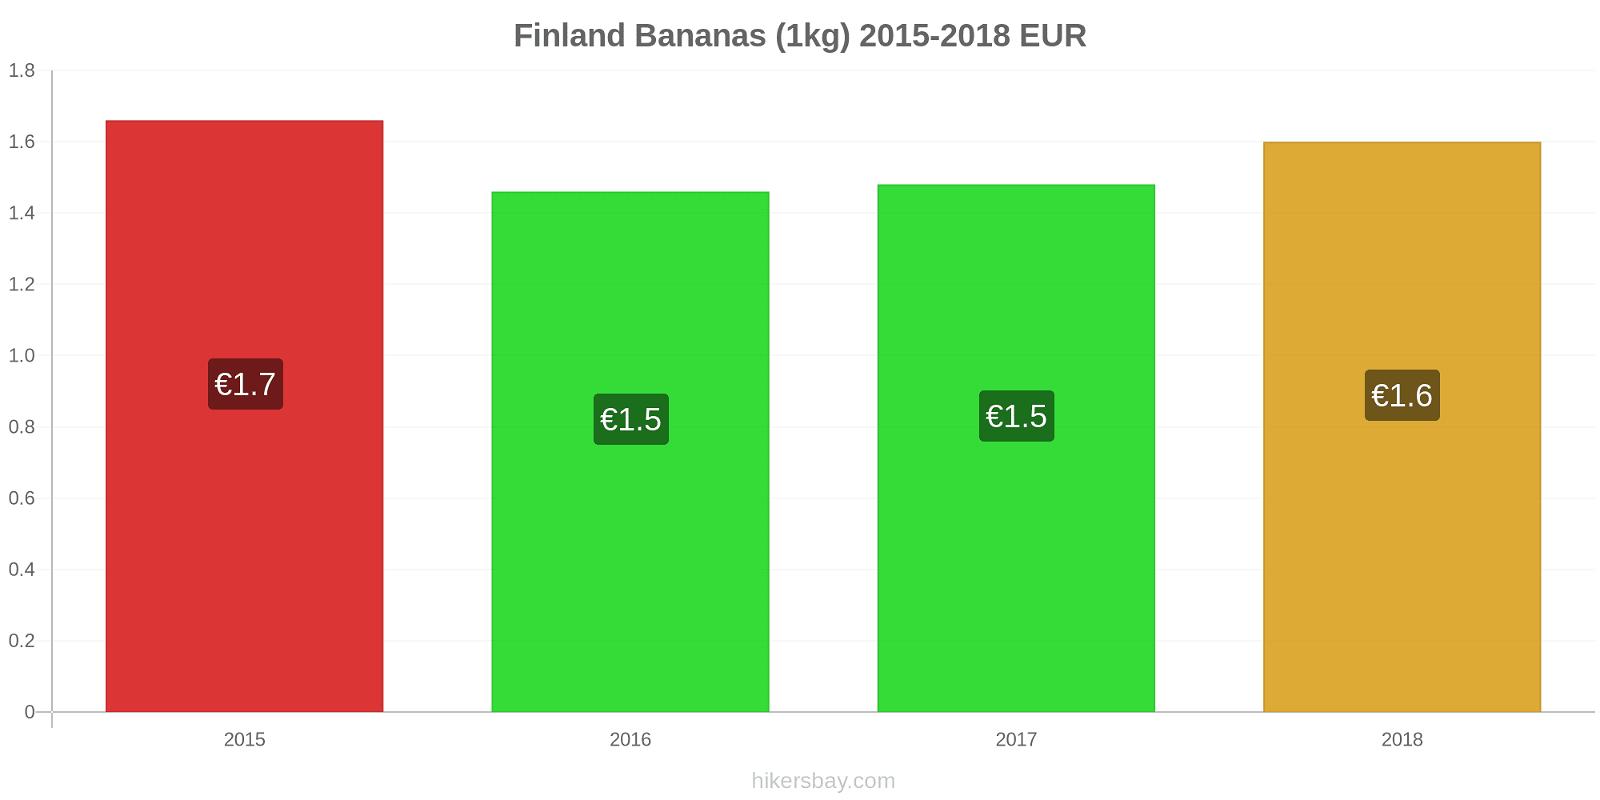 Finland price changes Bananas (1kg) hikersbay.com